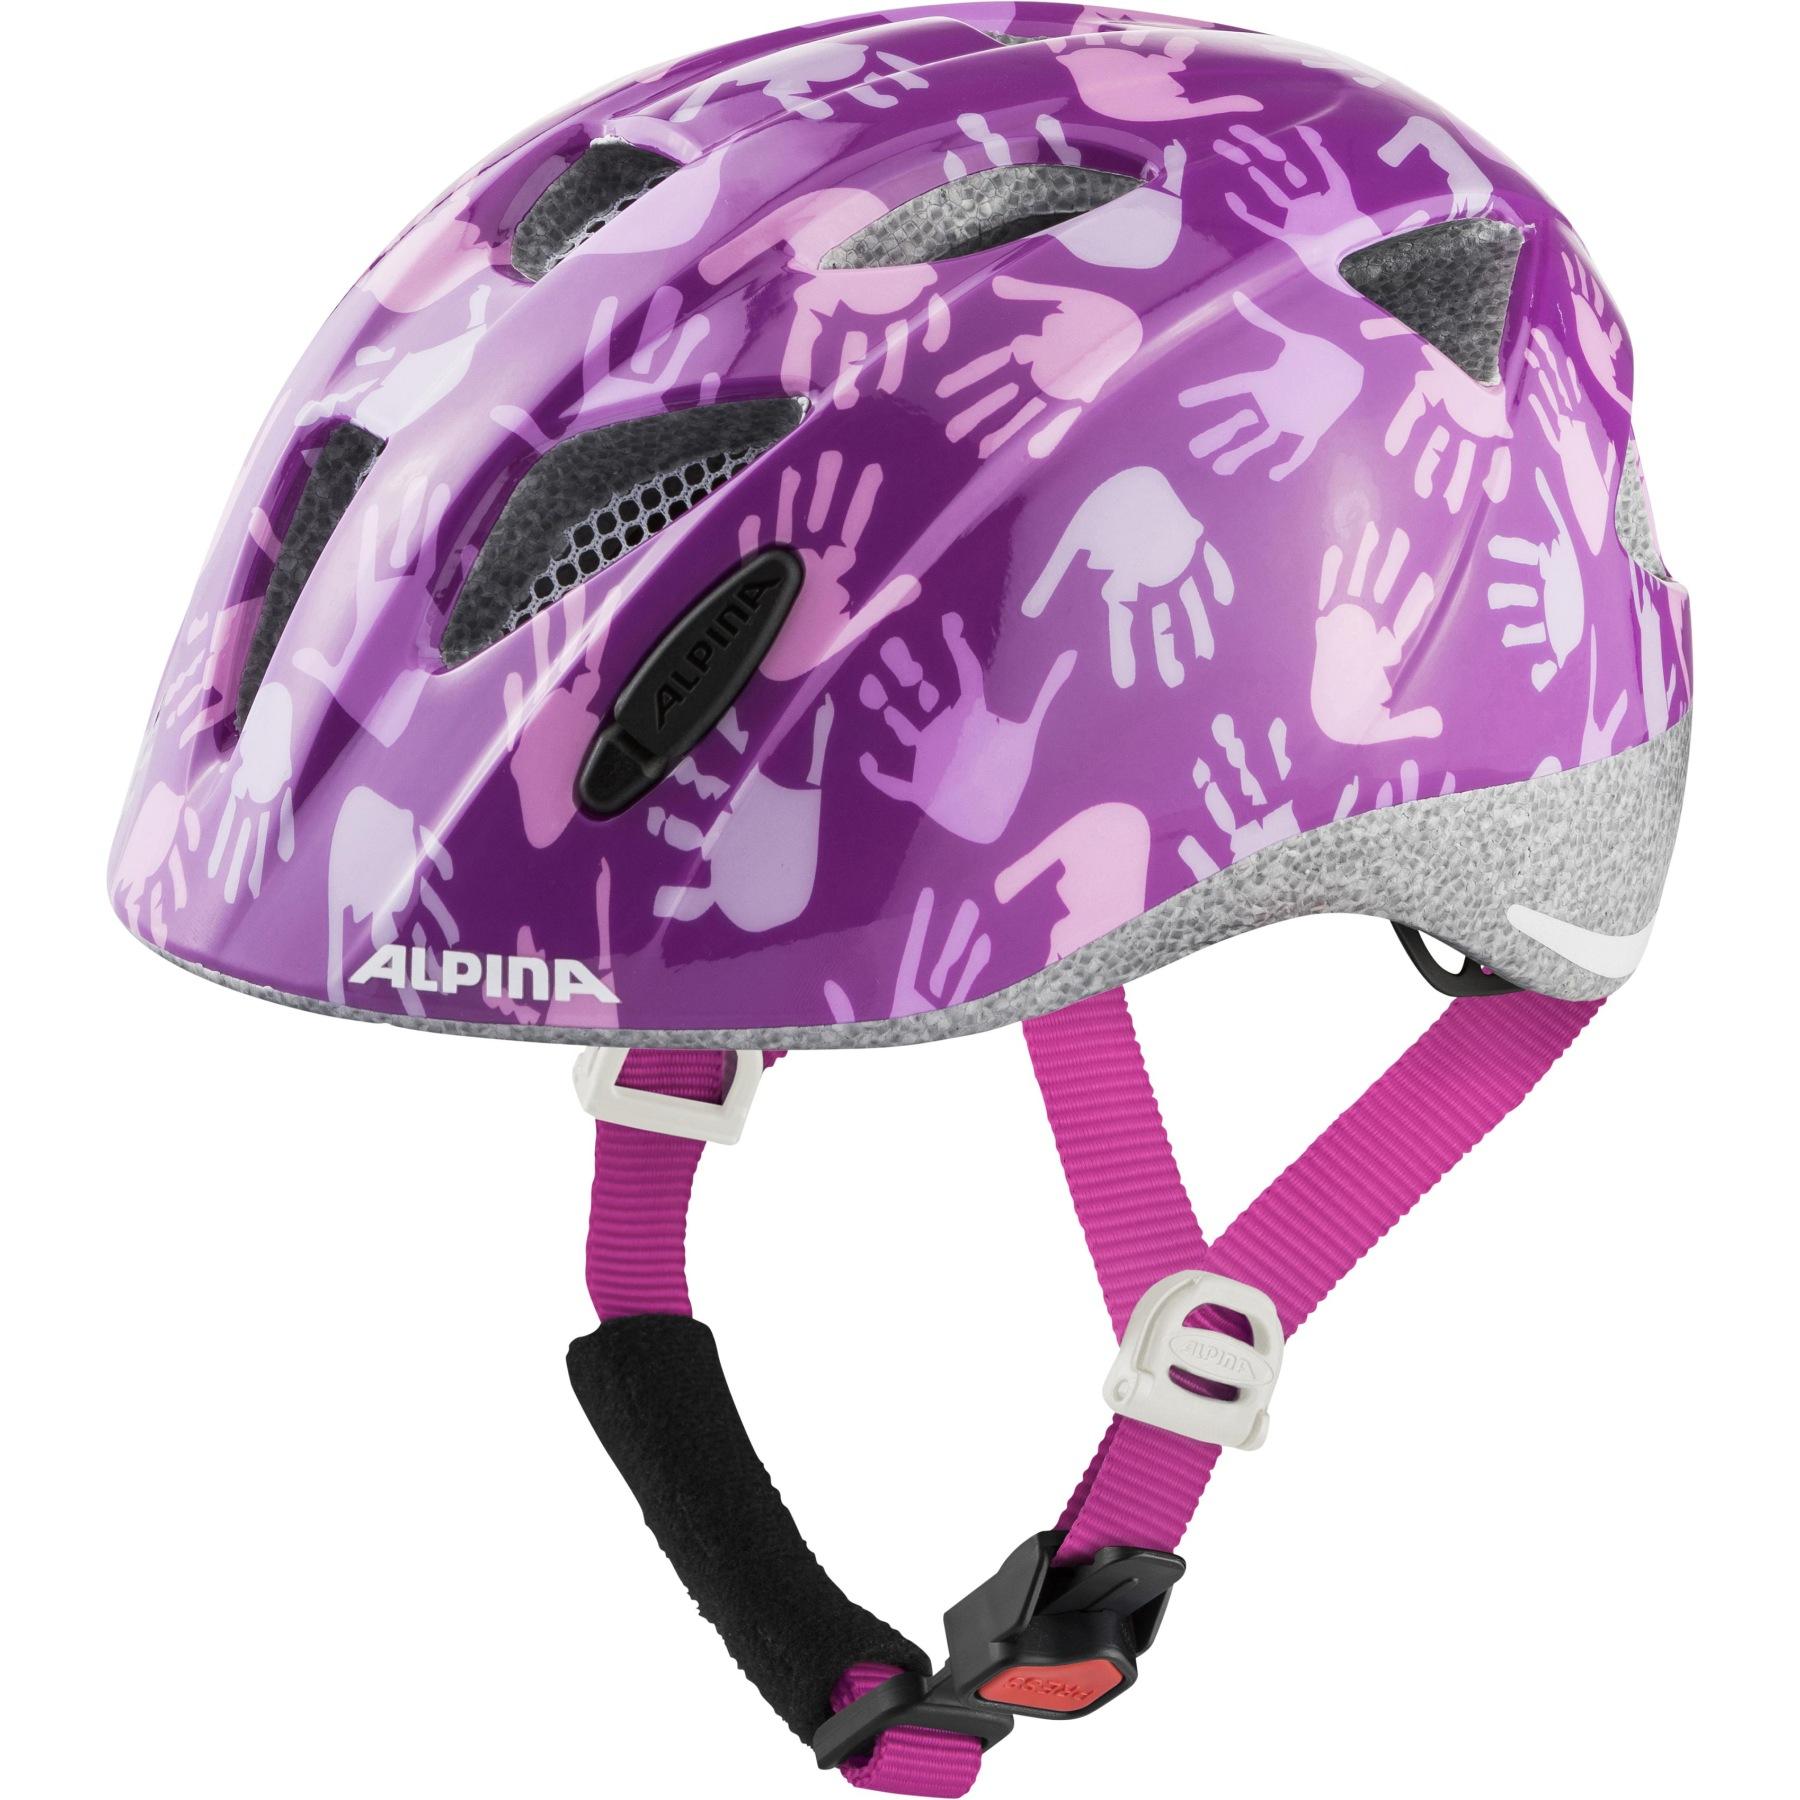 Alpina Ximo Kids Helmet - berry hands gloss